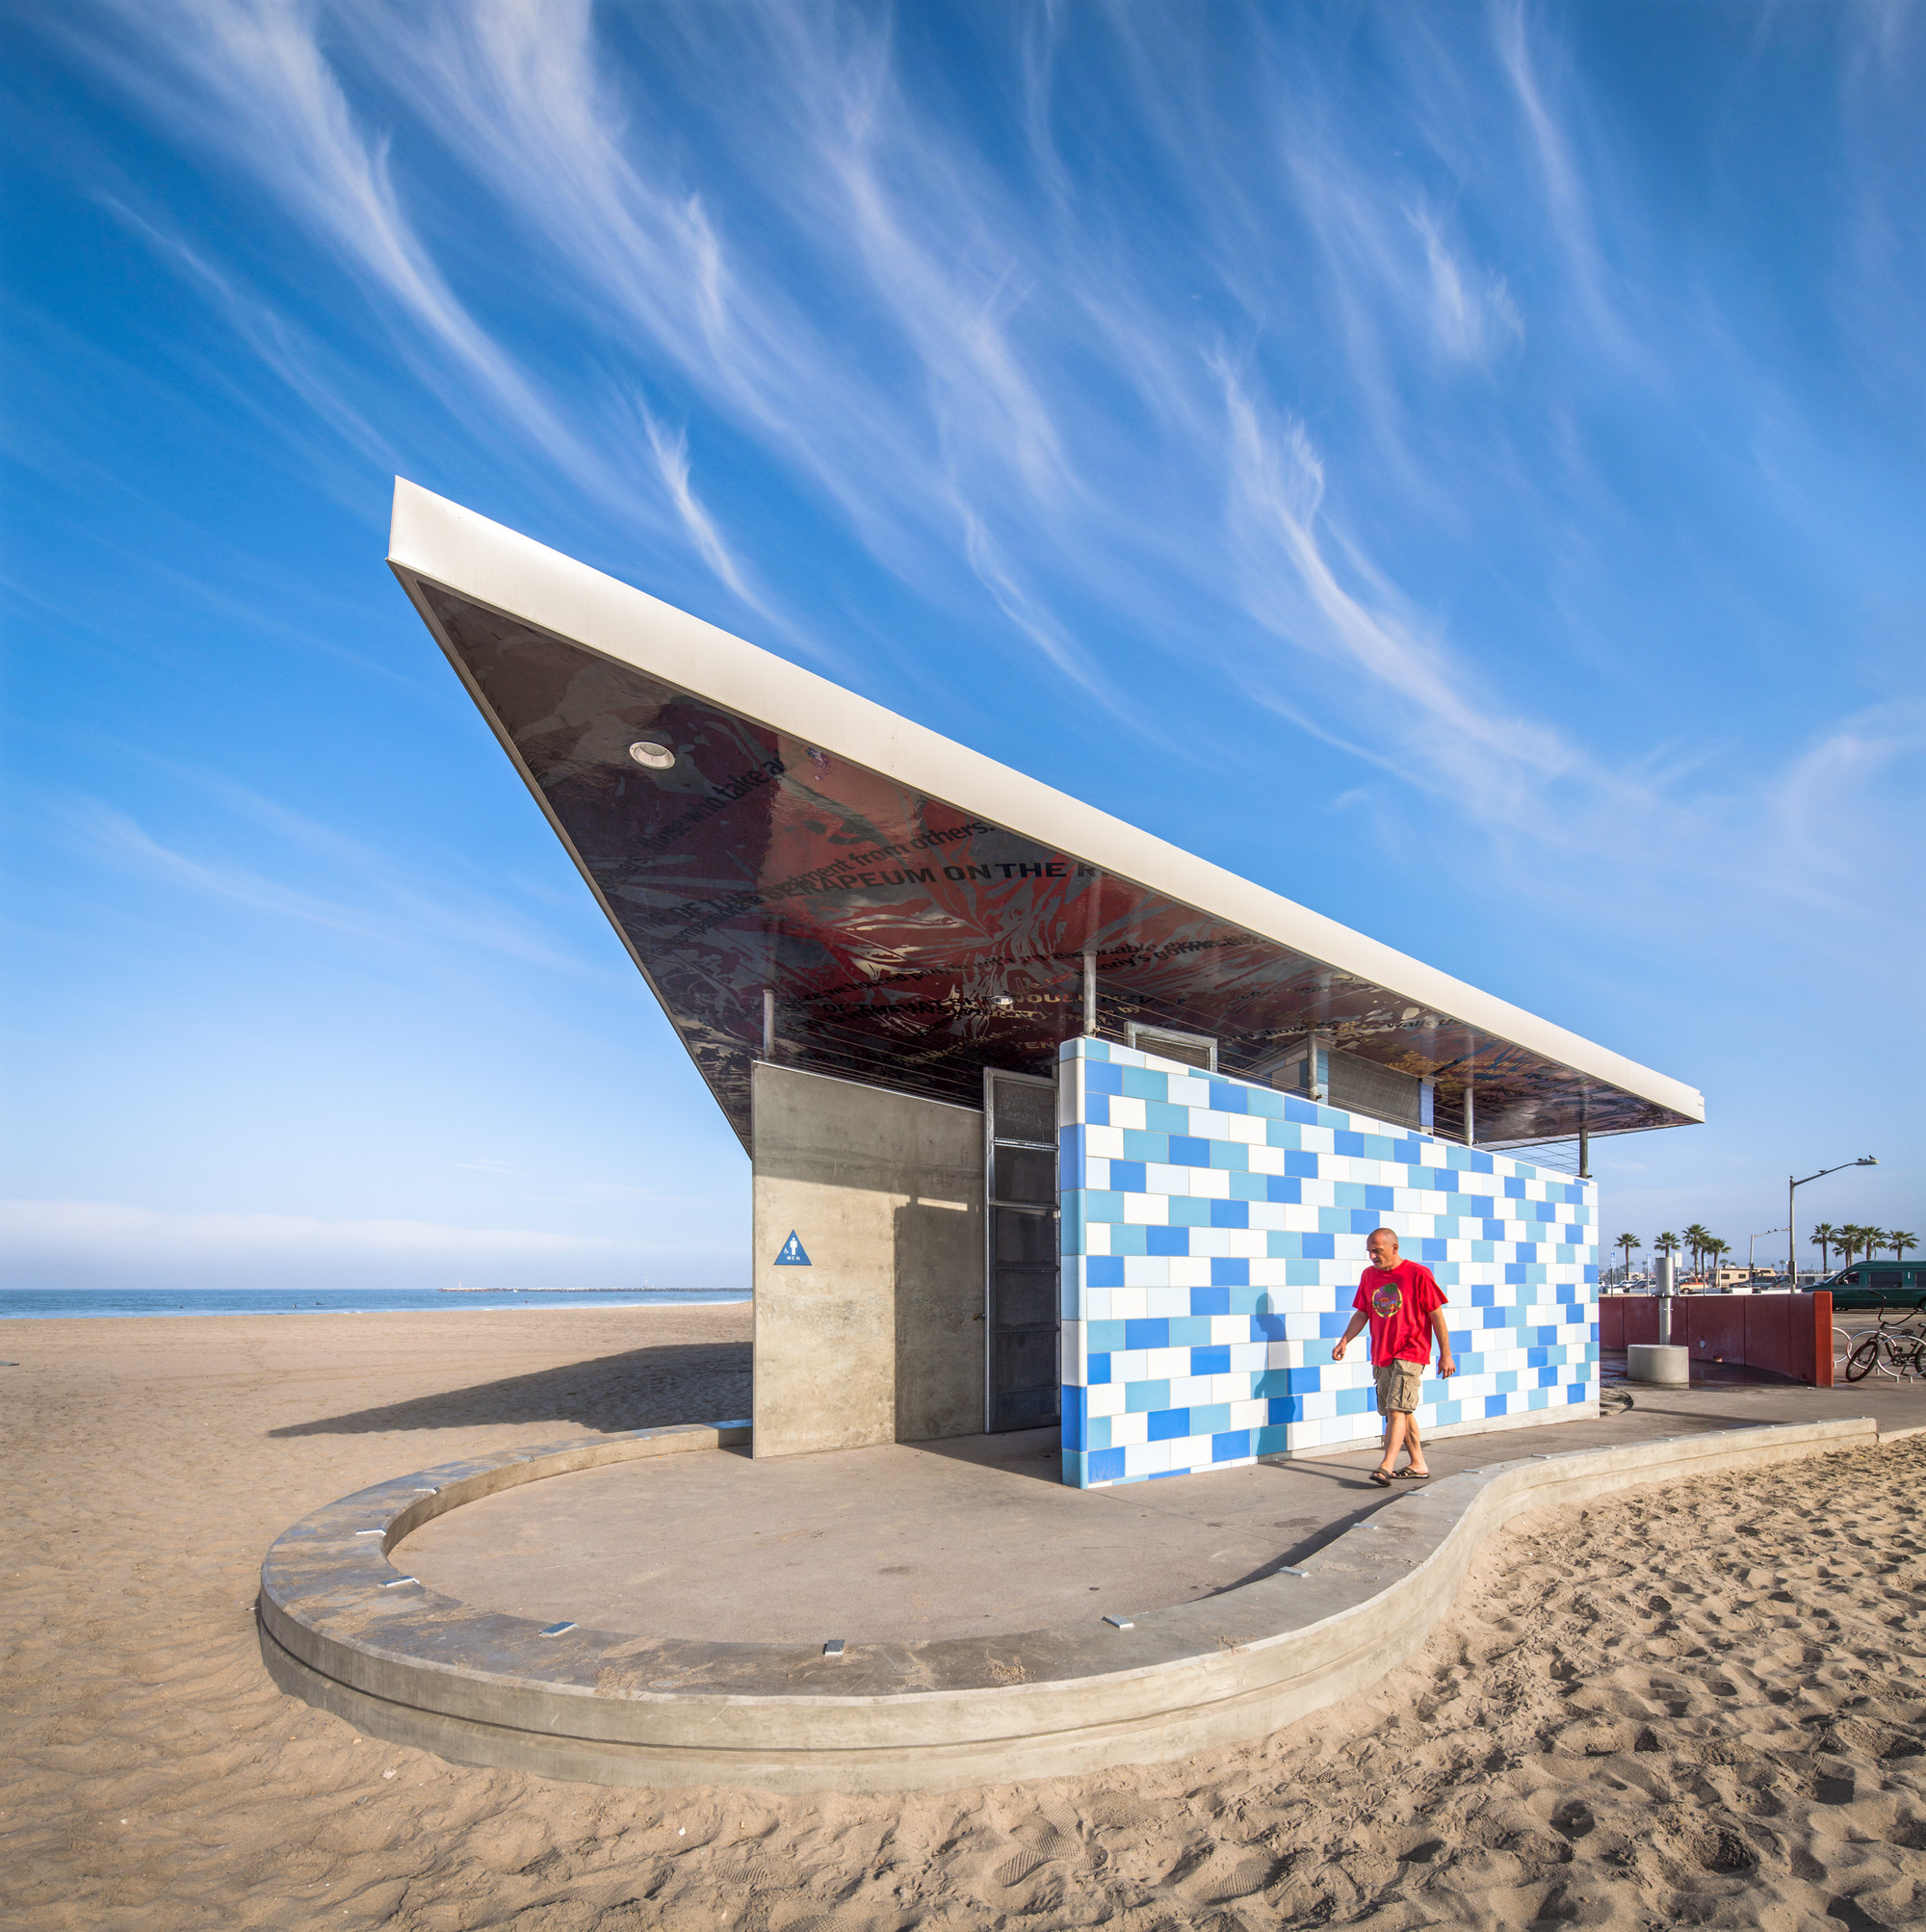 Ocean Beach: Ocean Beach Comfort Station / Kevin De Freitas Architects